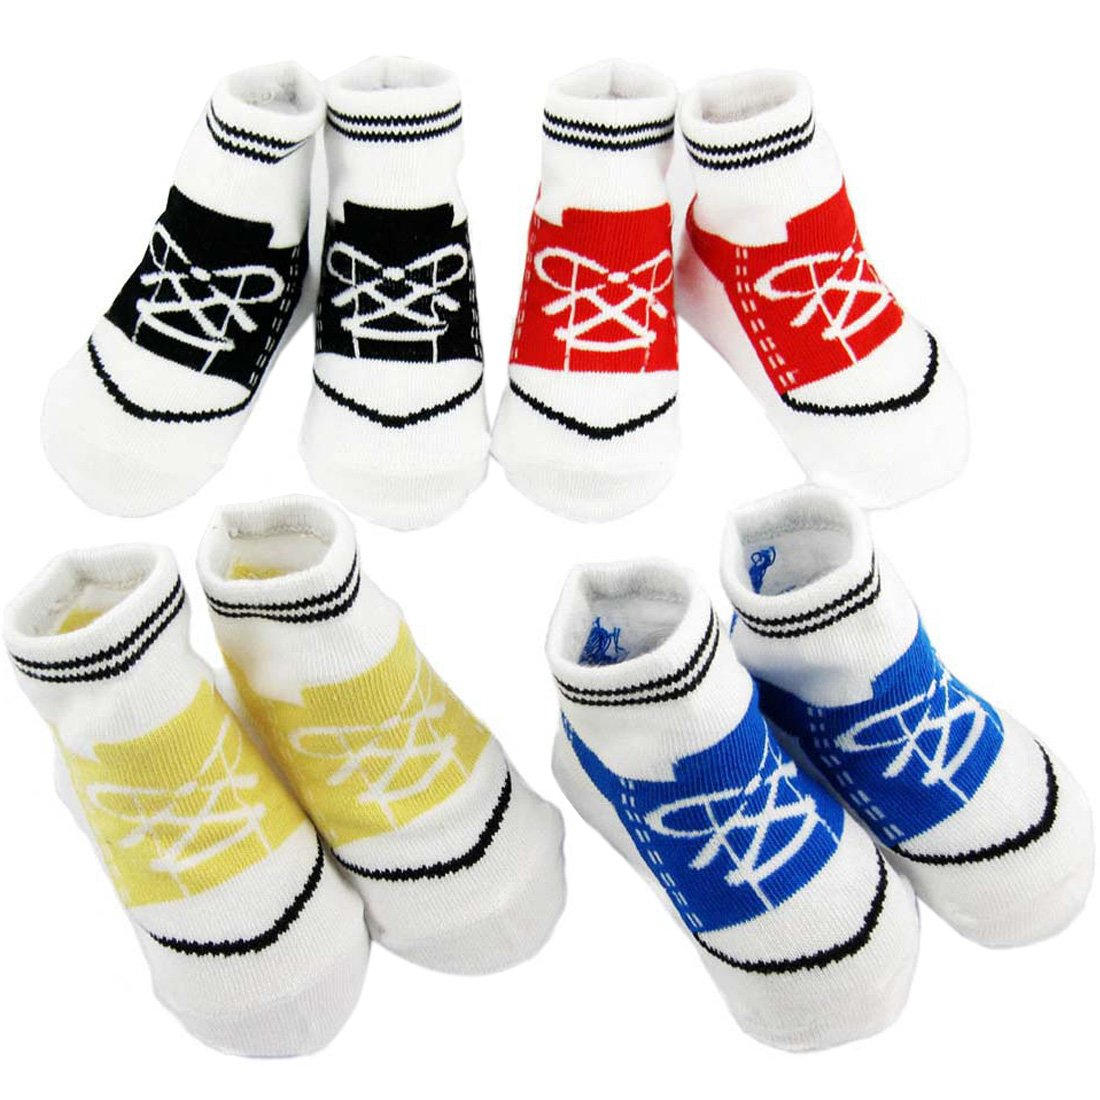 KF Baby Non-Skid Baby Boy Sneaker Socks